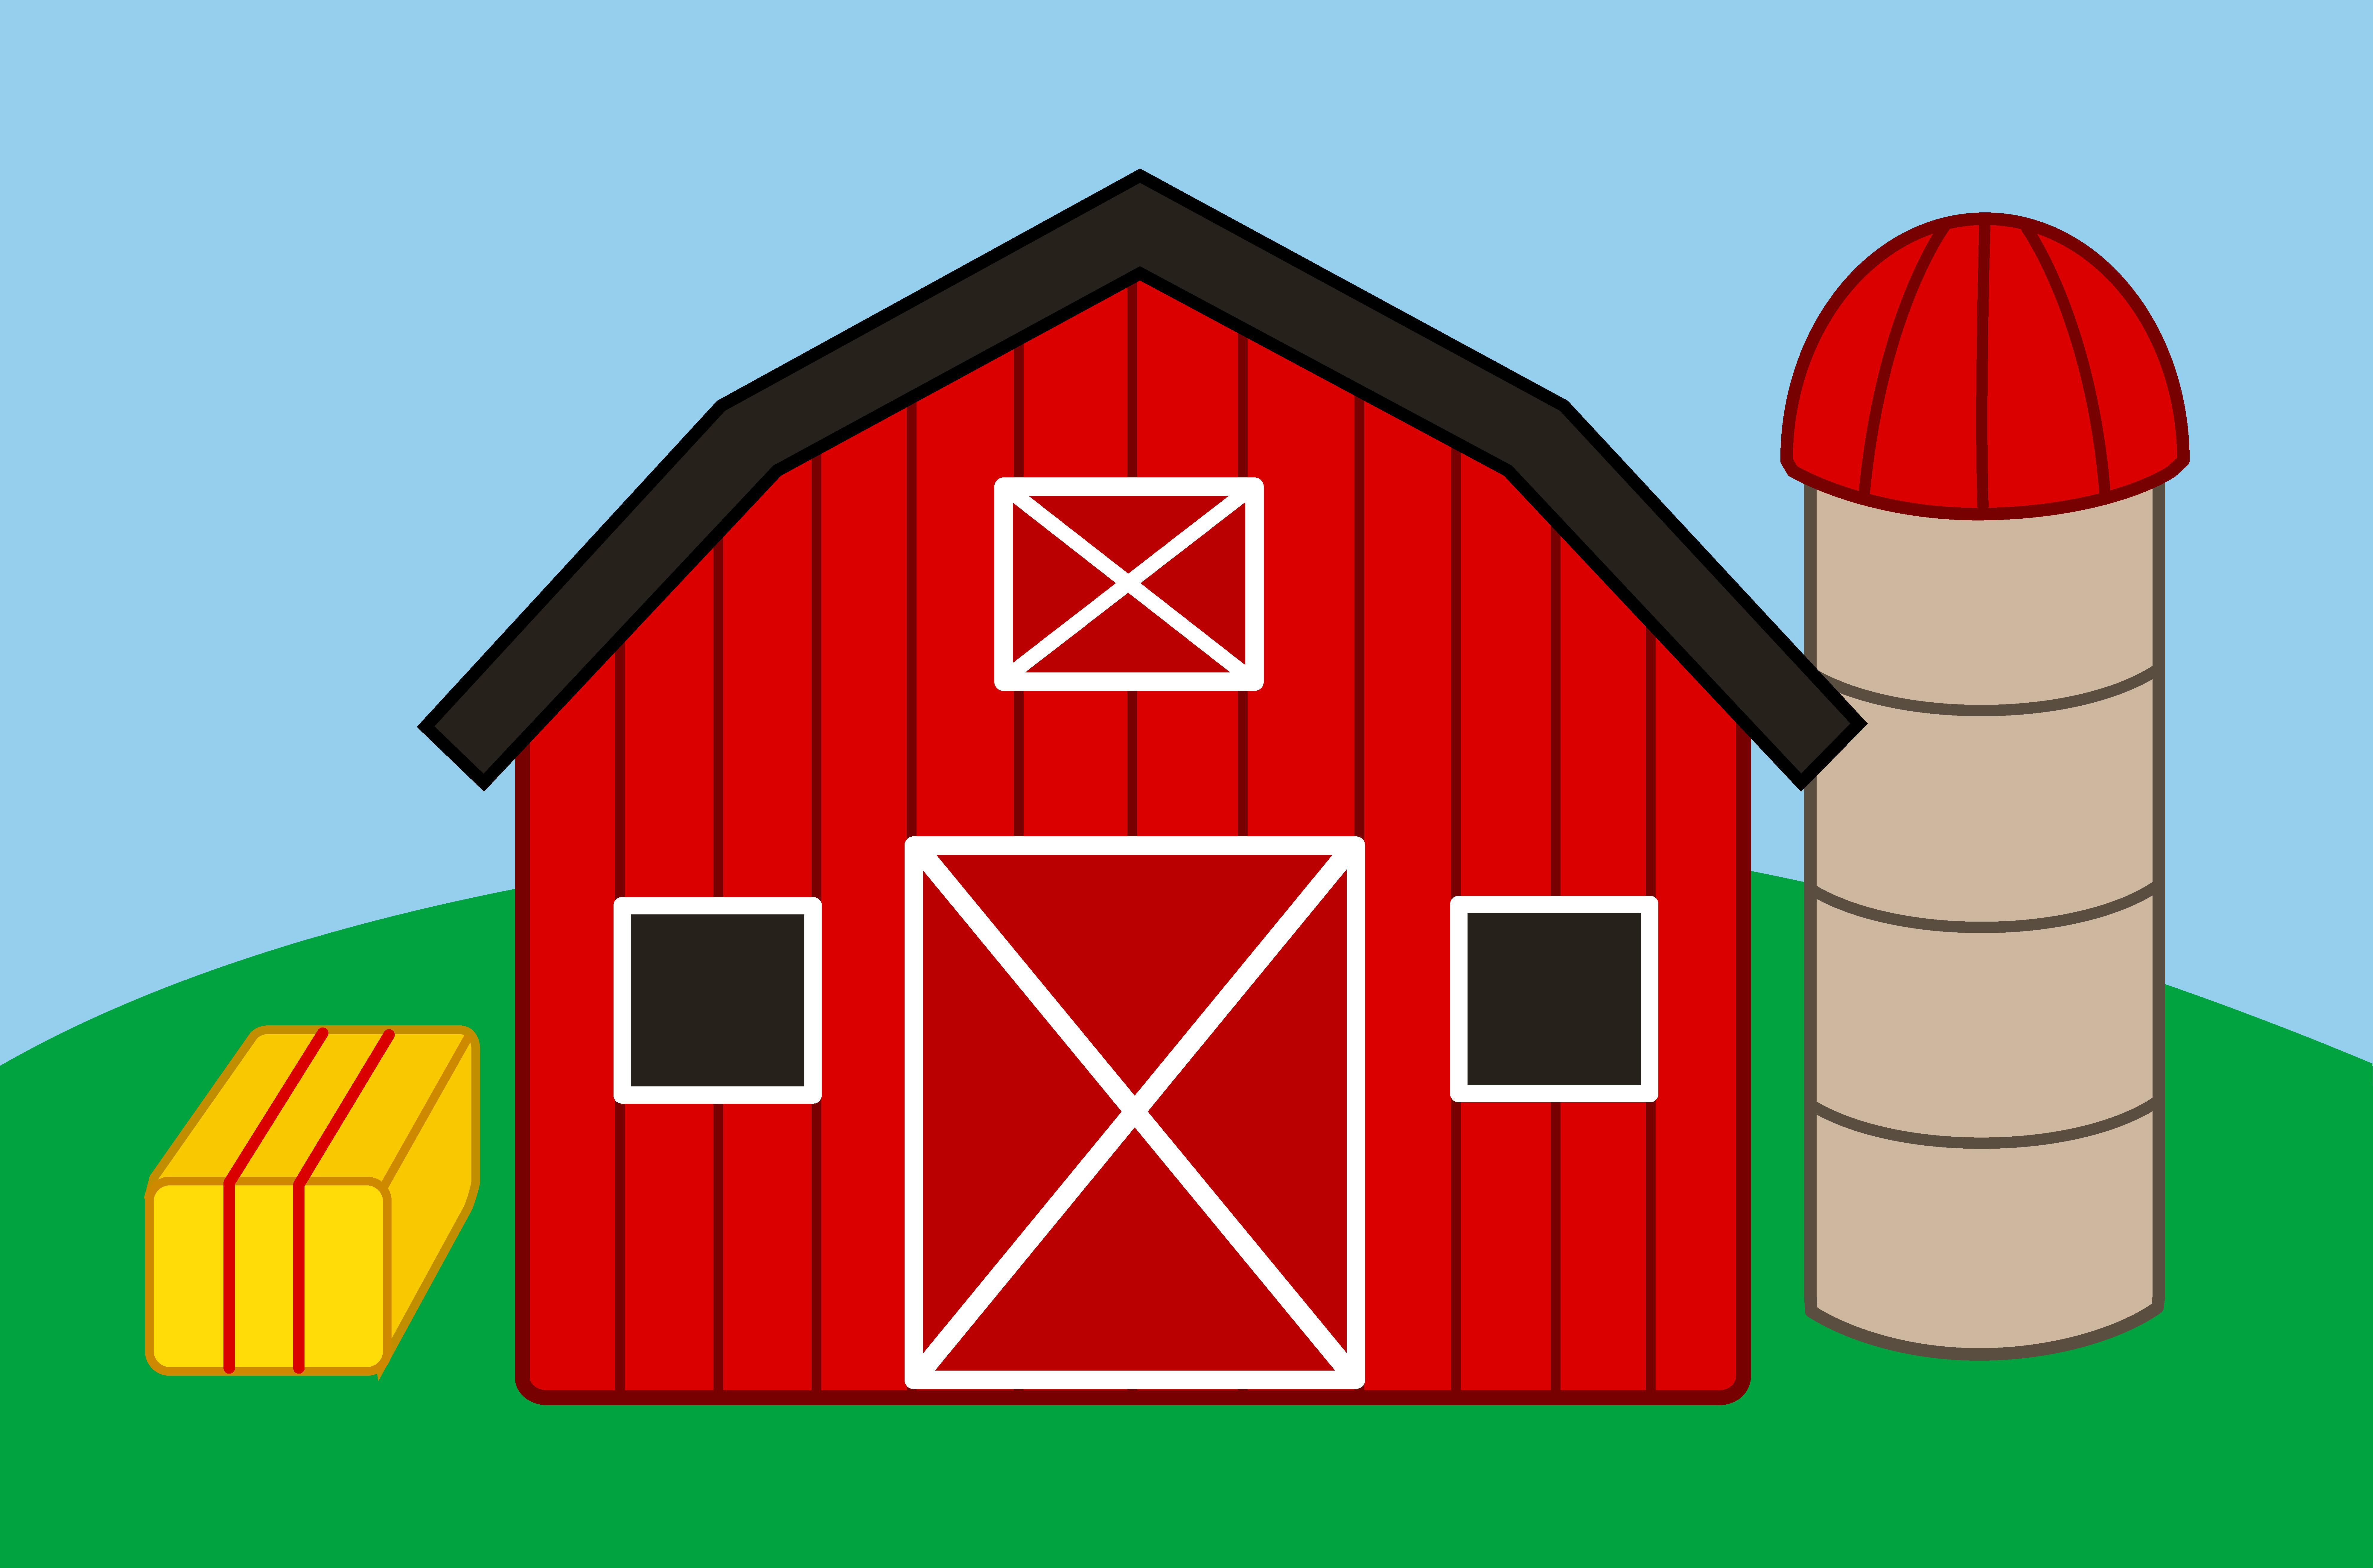 Cute Farm With Barn and Silo - Free Clip Art - Farm House PNG HD